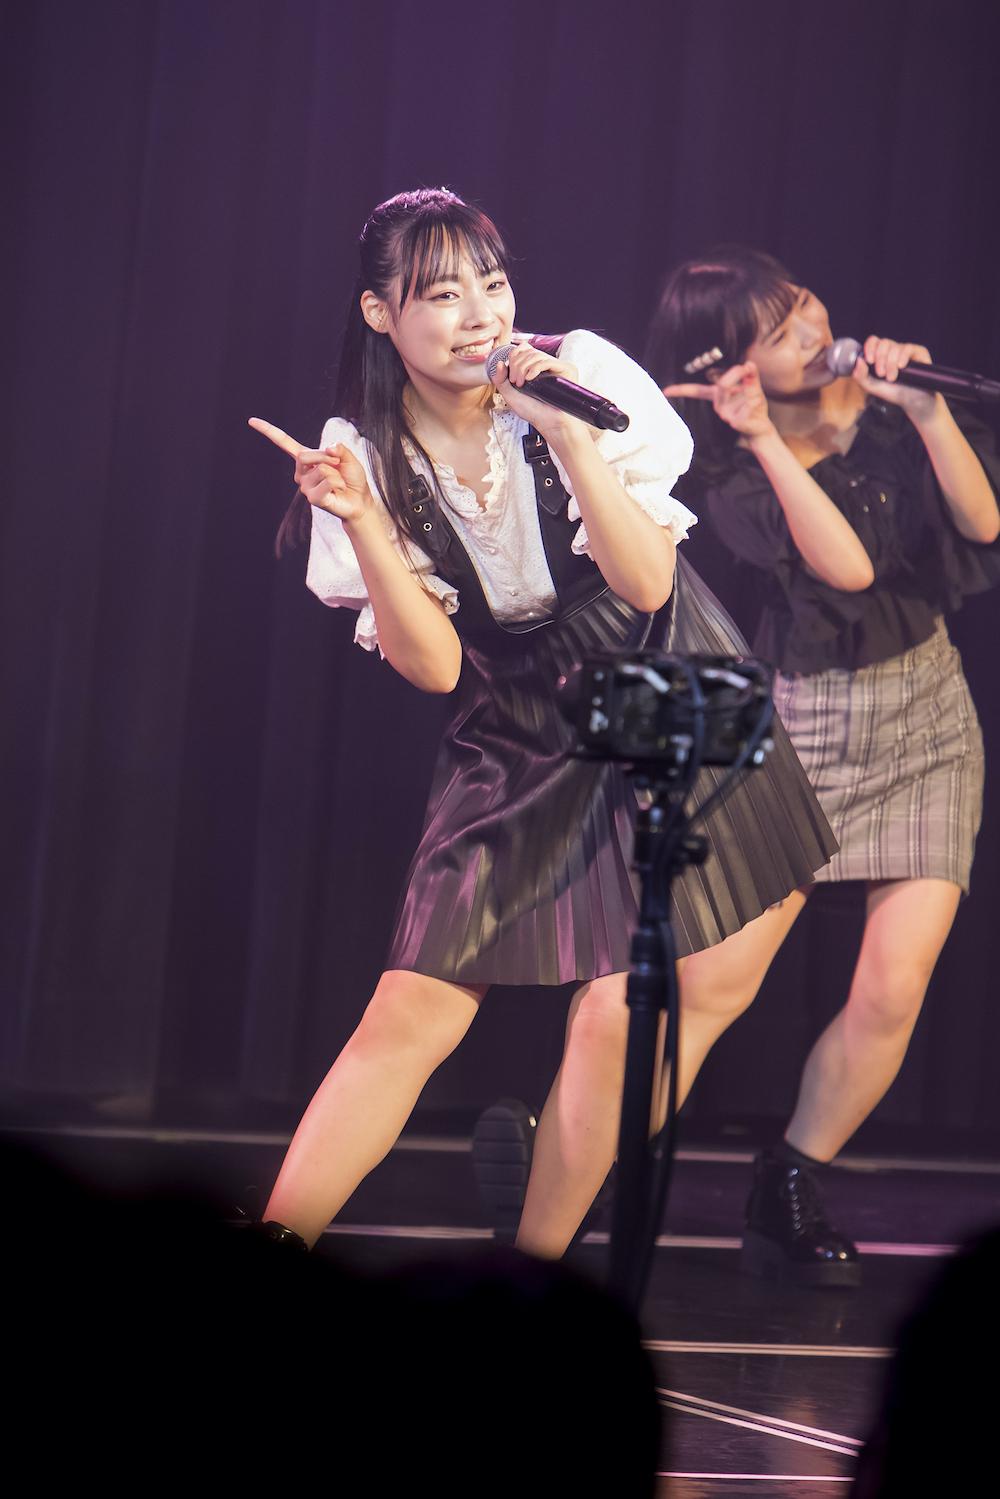 NMB48 7.5期生 イ・シヨンが劇場公演デビュー!吉田朱里プロデュース 研究生公演「Will be idol」